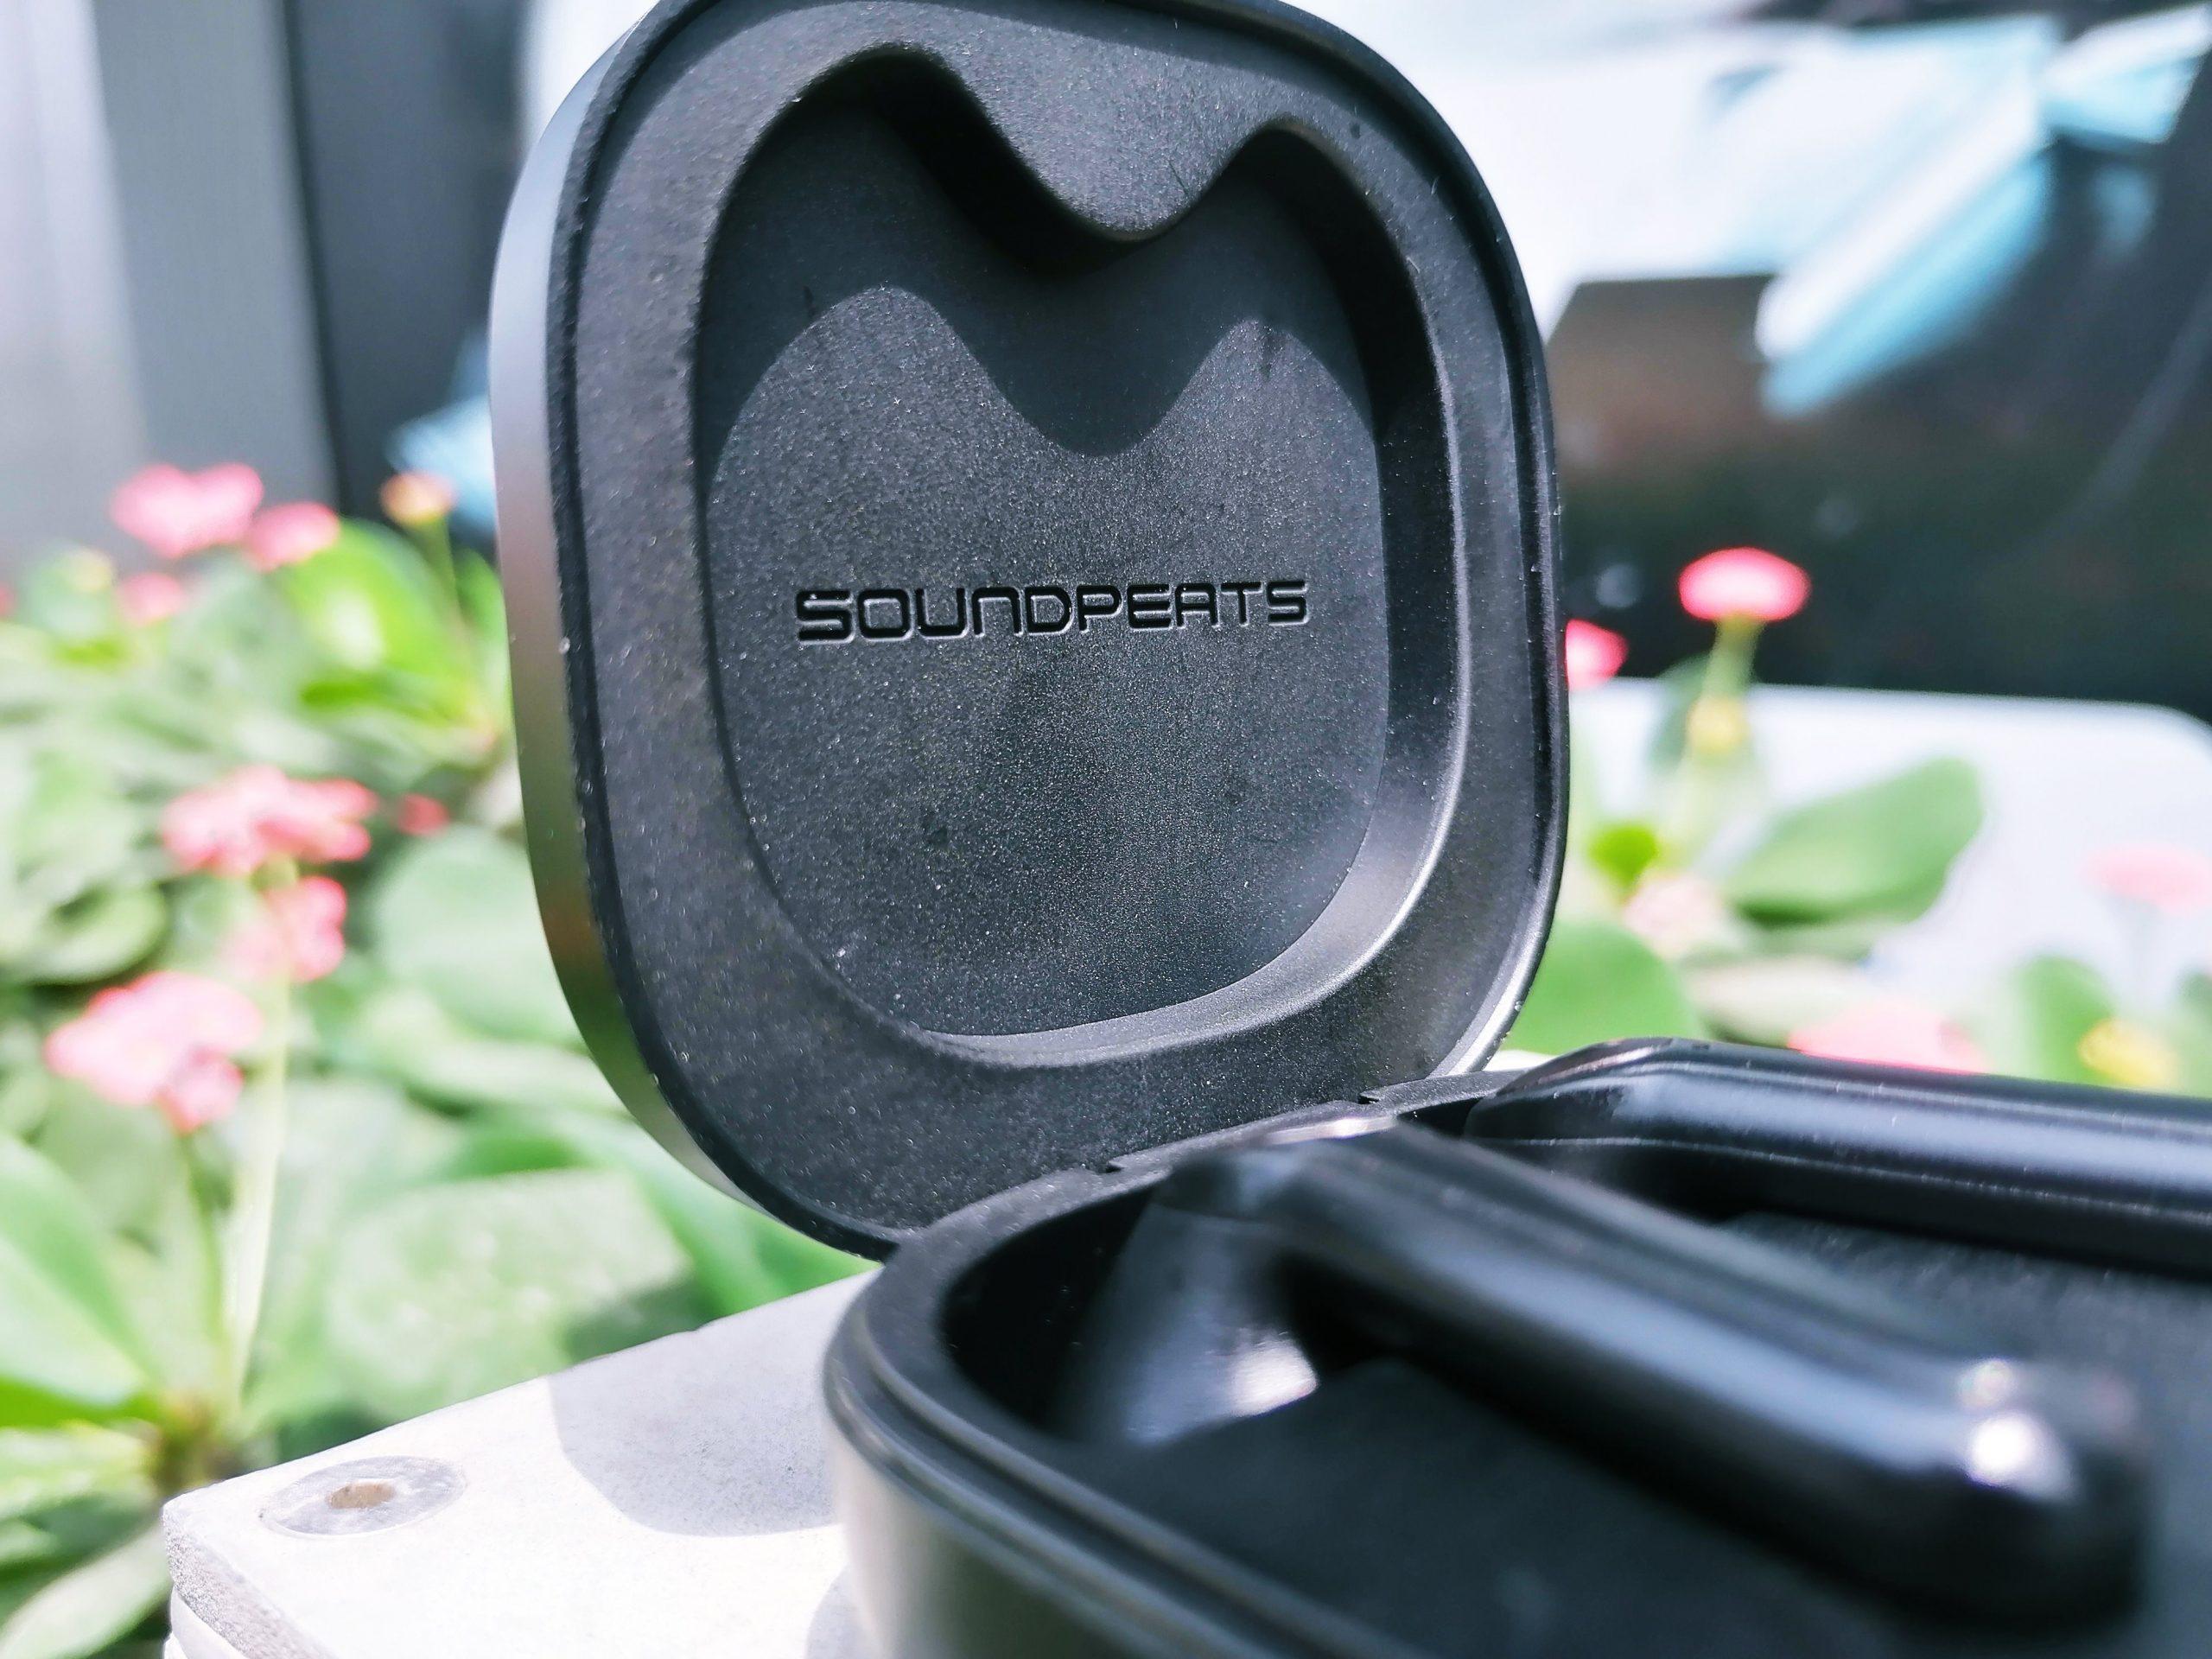 SoundPEATS TrueAir 2 casing opened